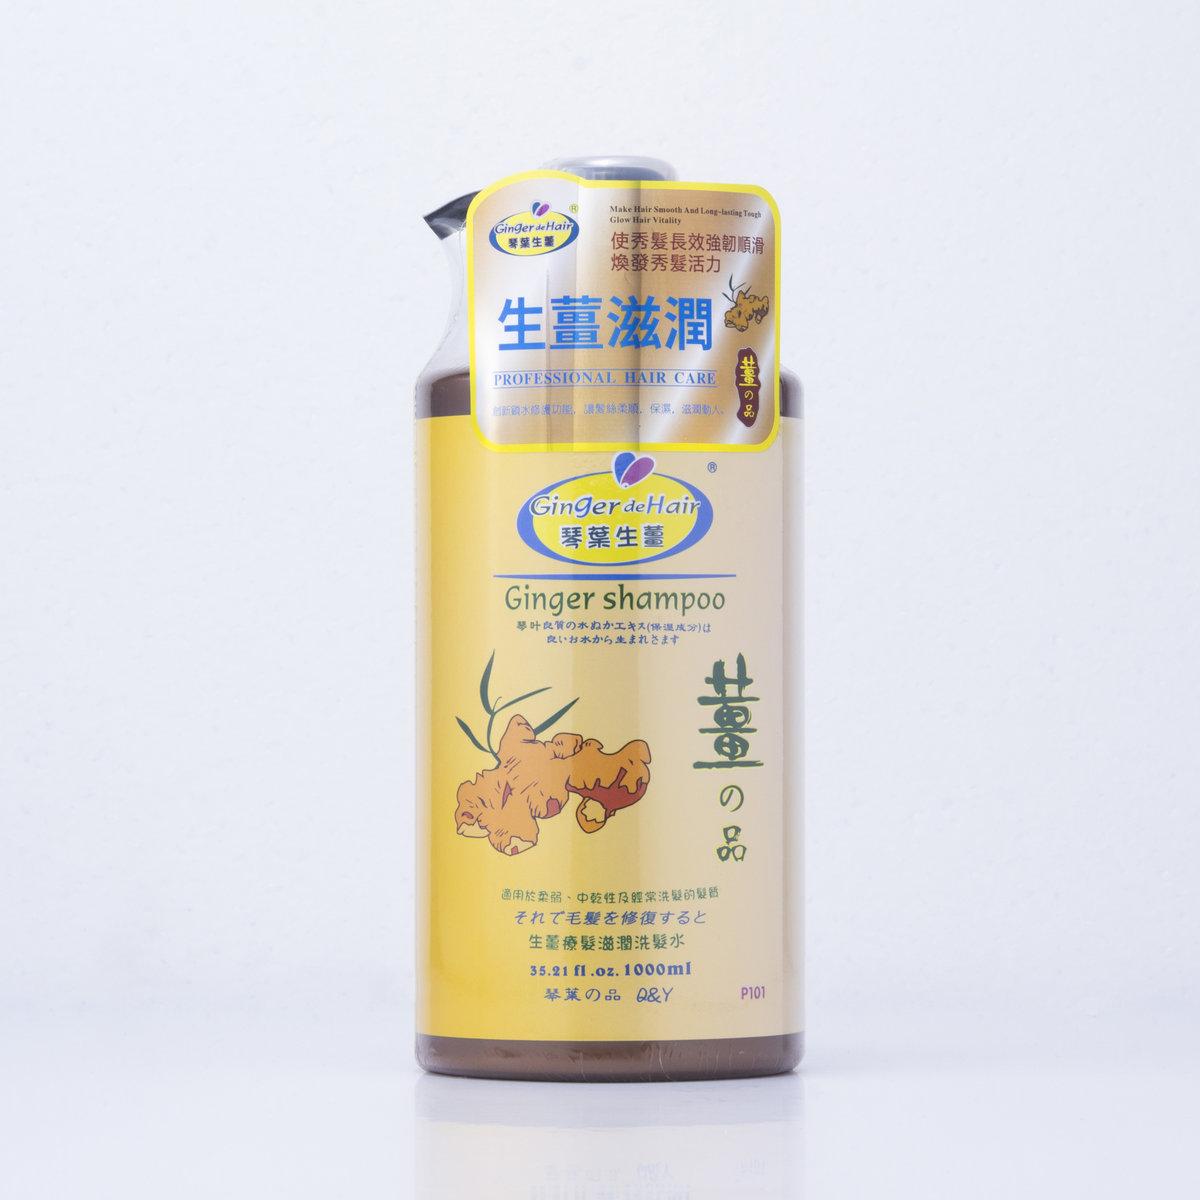 Ginger de Hair生薑療髮滋潤洗髮水1000ml[P101]